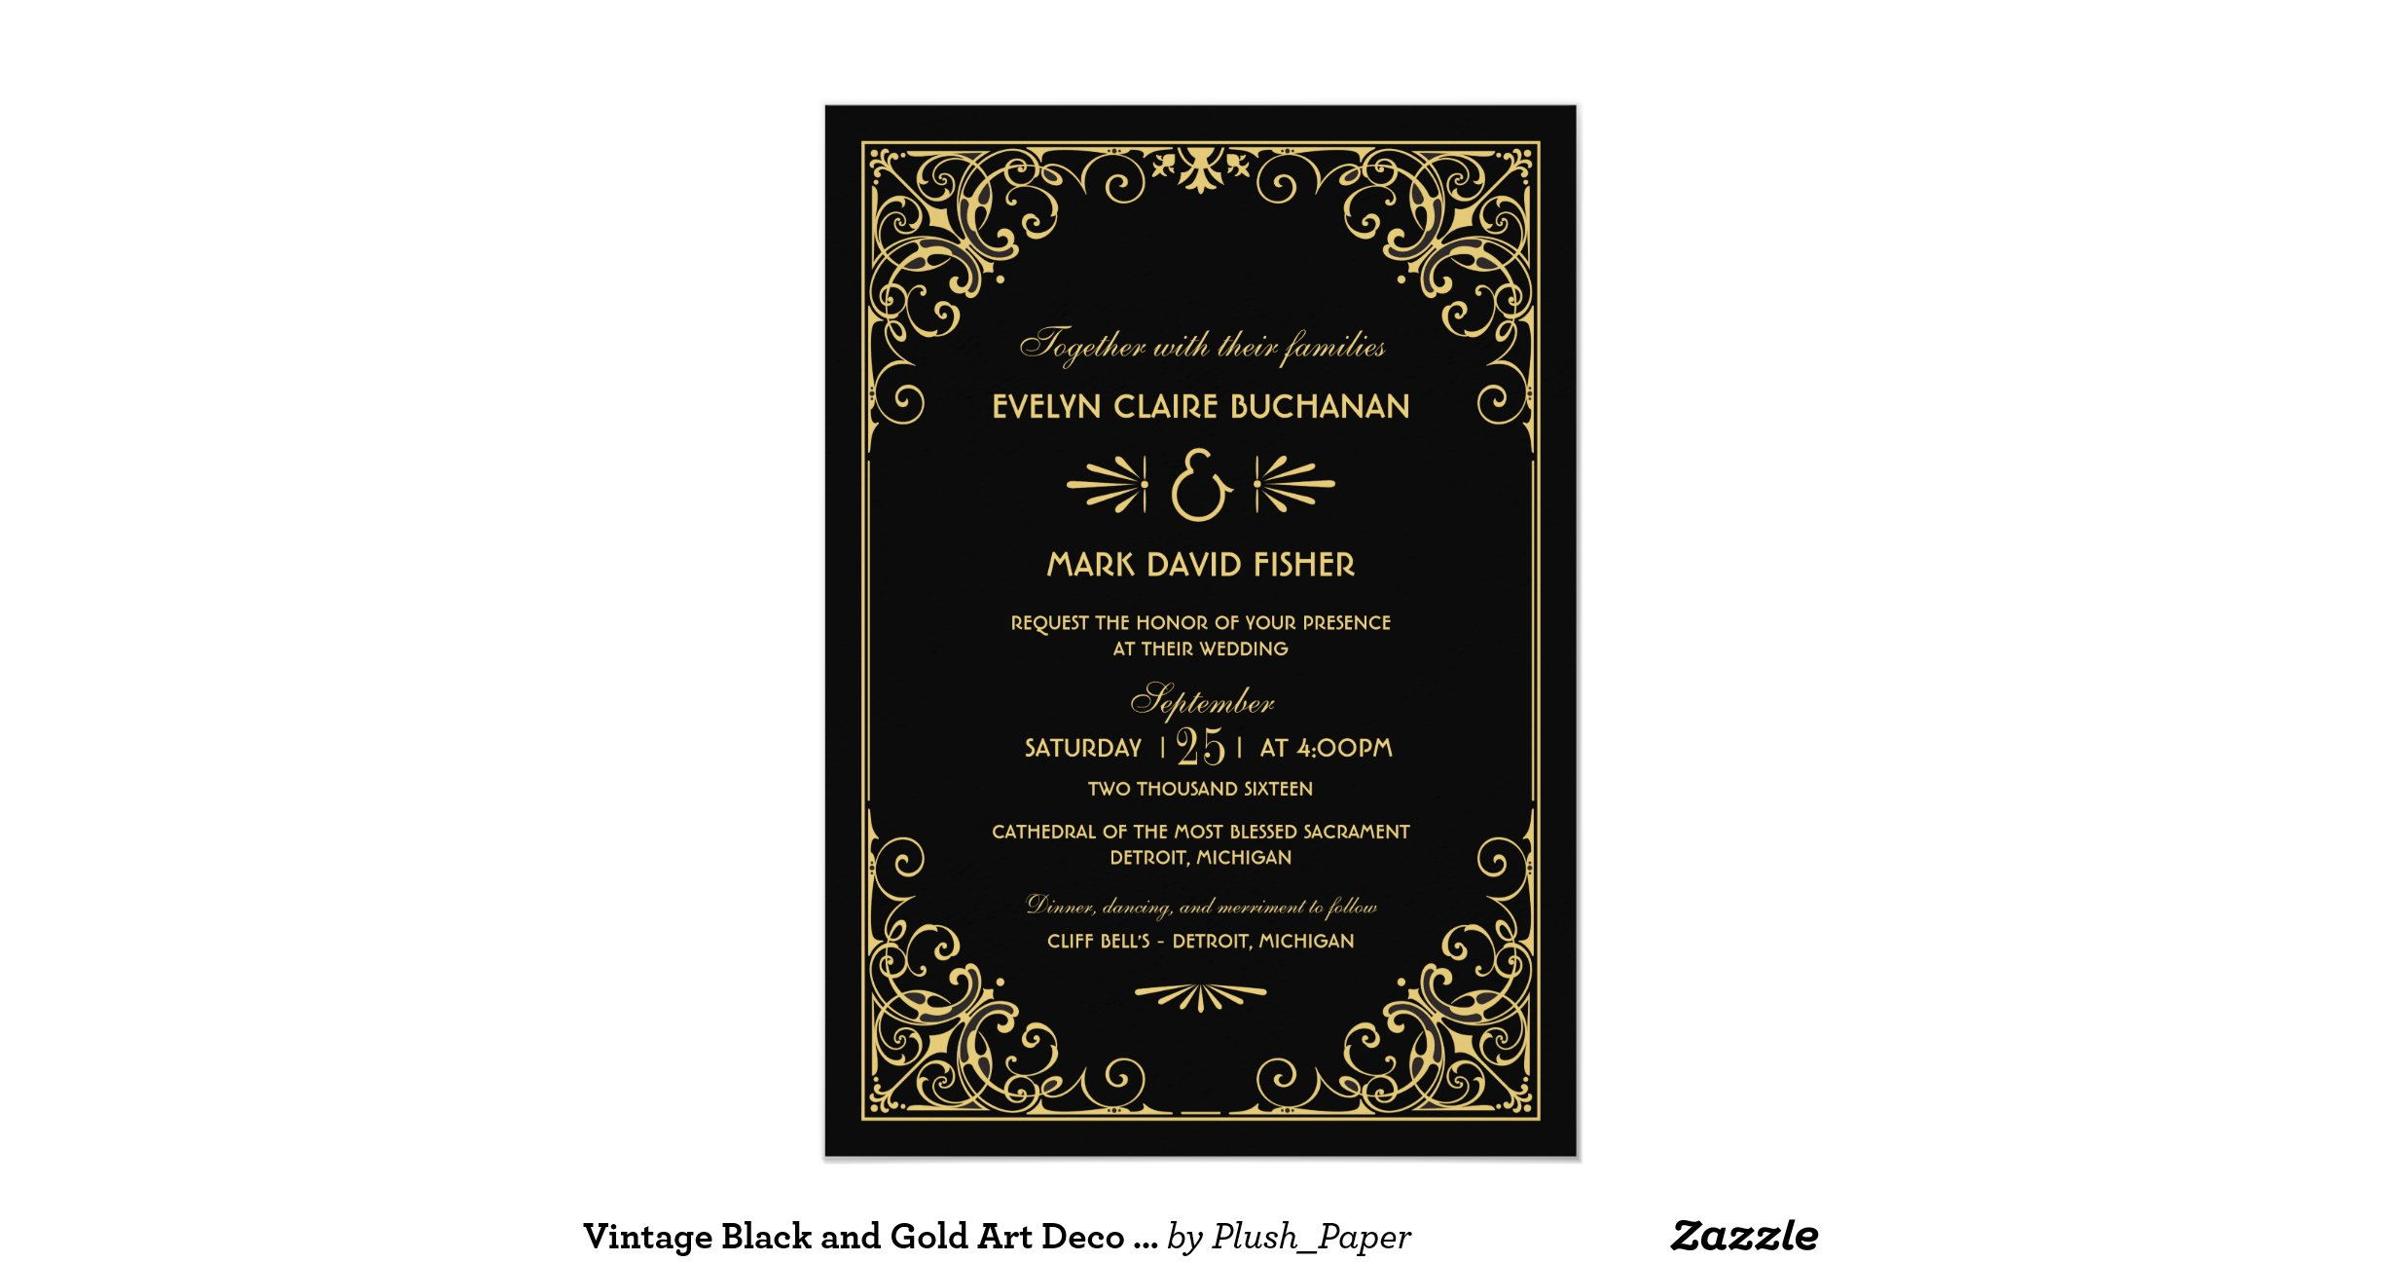 deco inspired wedding invitation wedding - 28 images - 1920s wedding ...